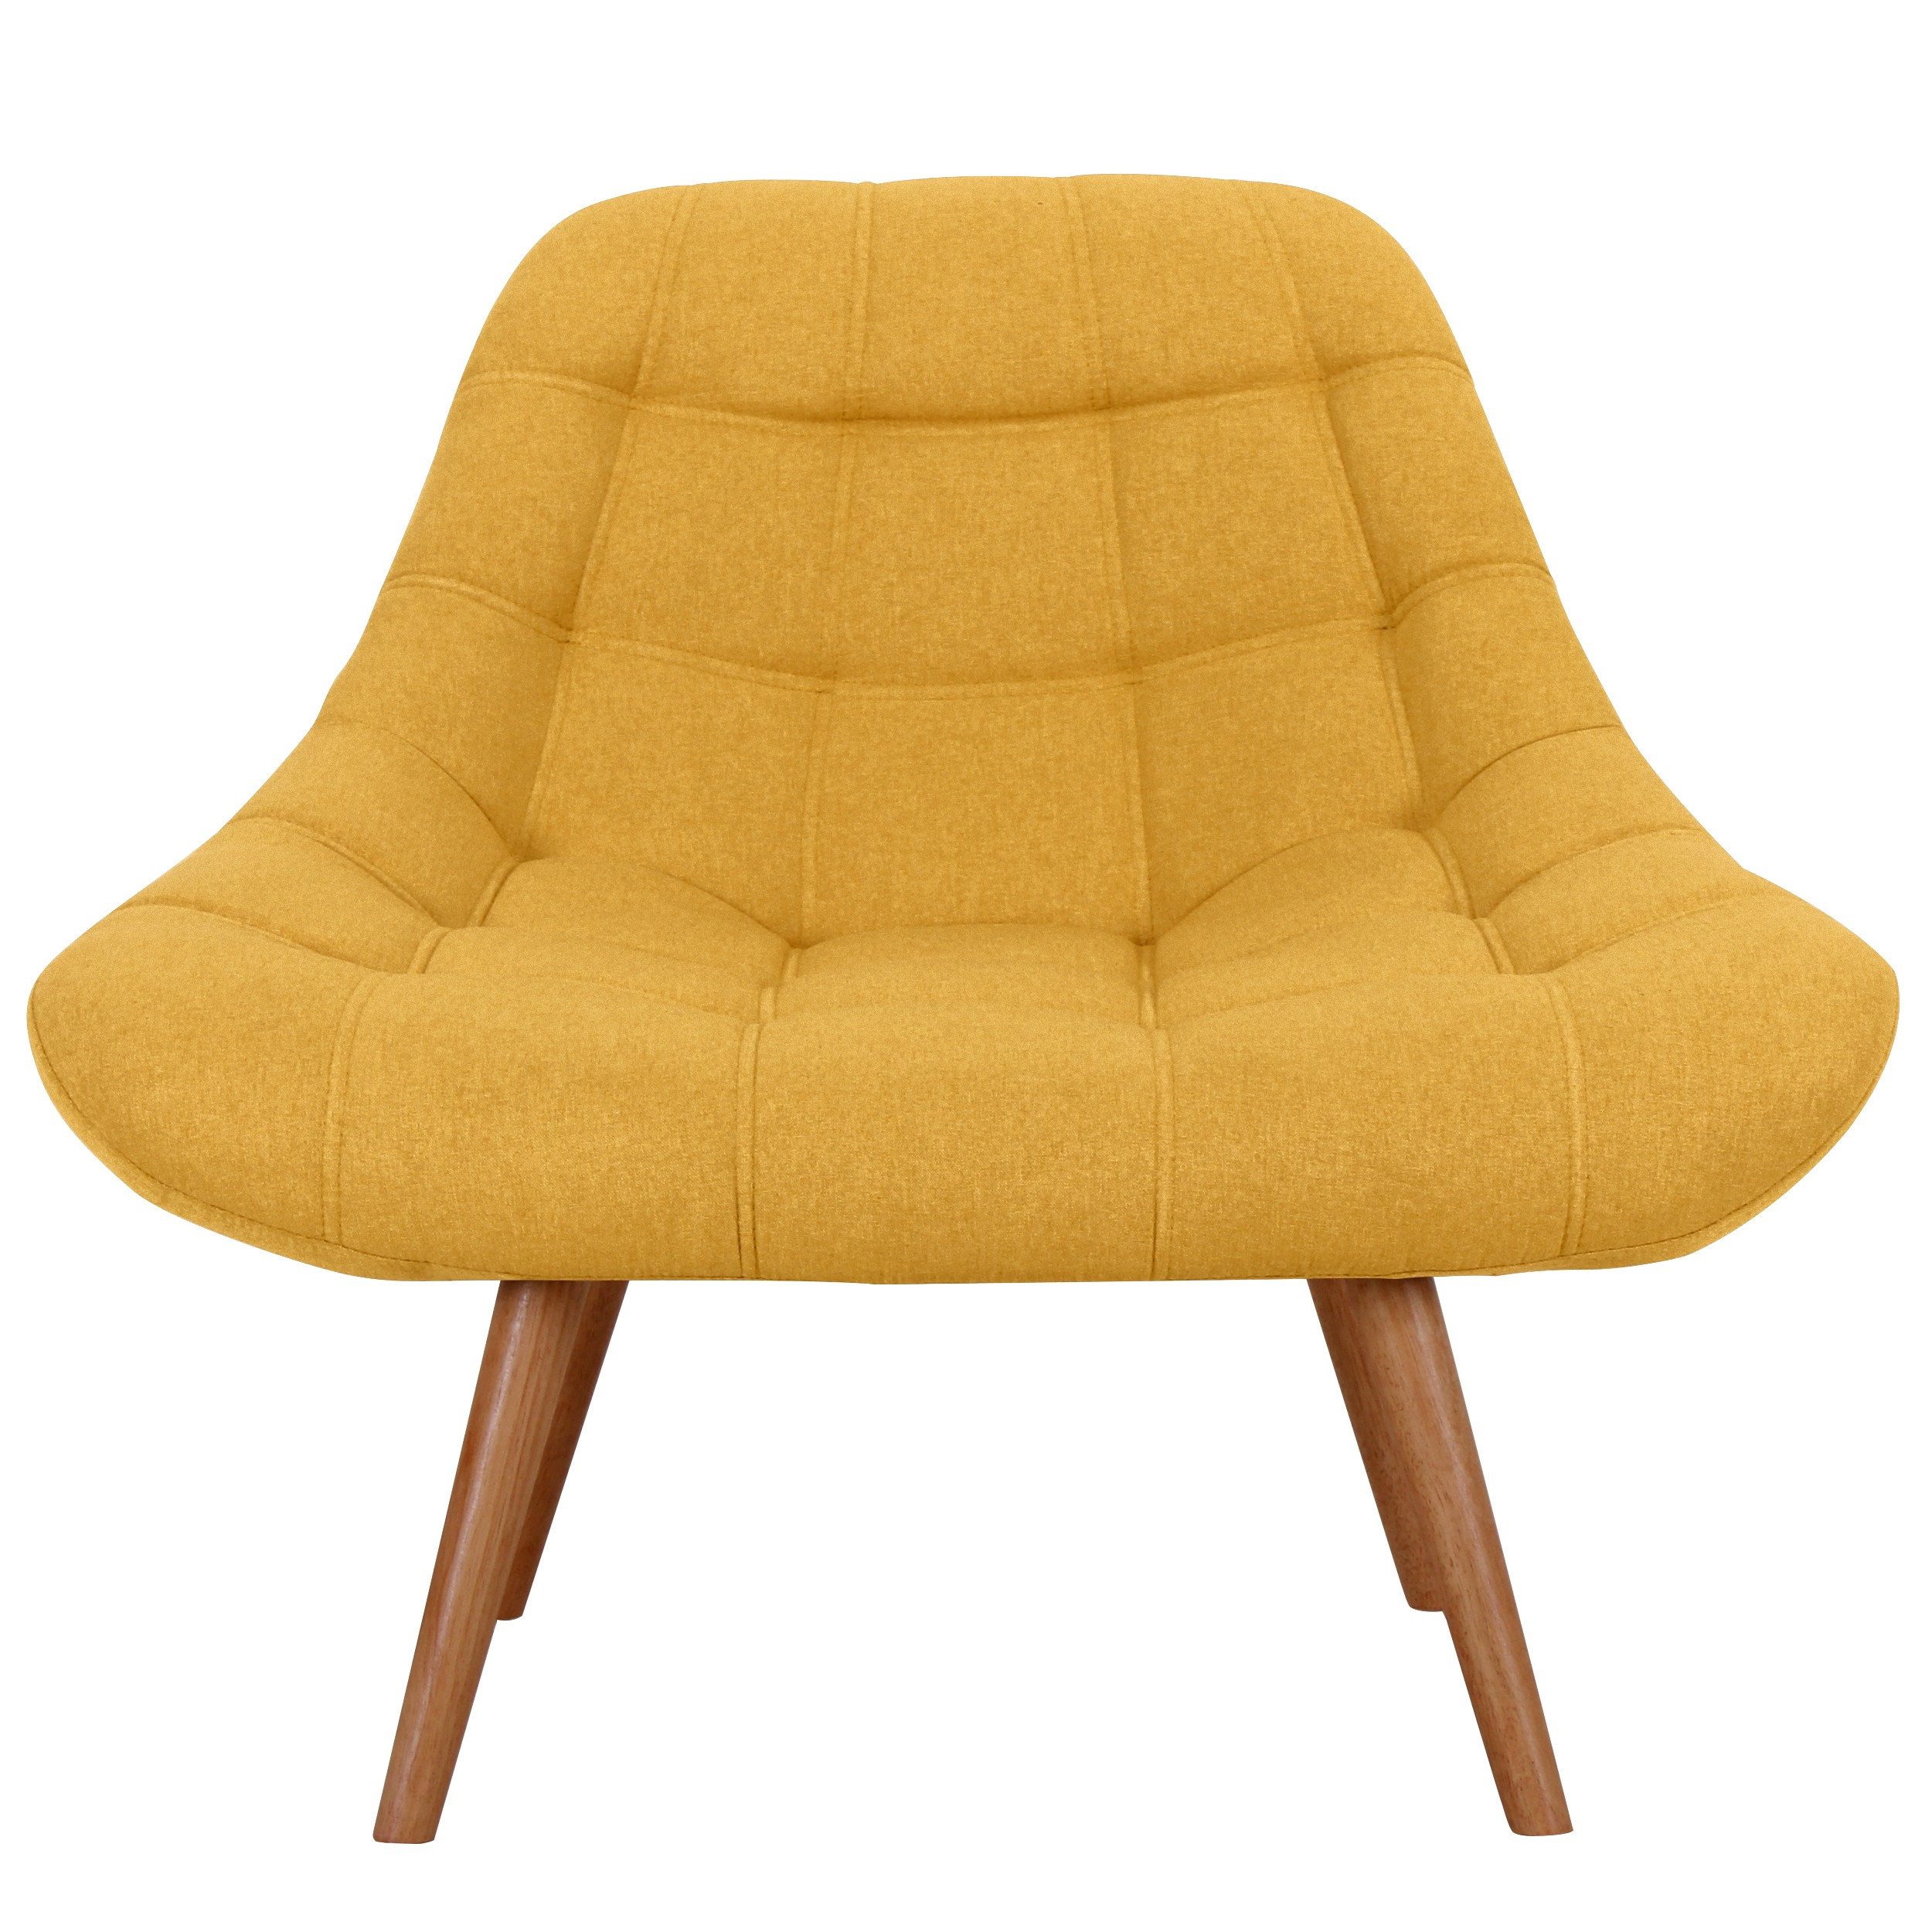 acheter fauteuil jaune tissu pieds bois